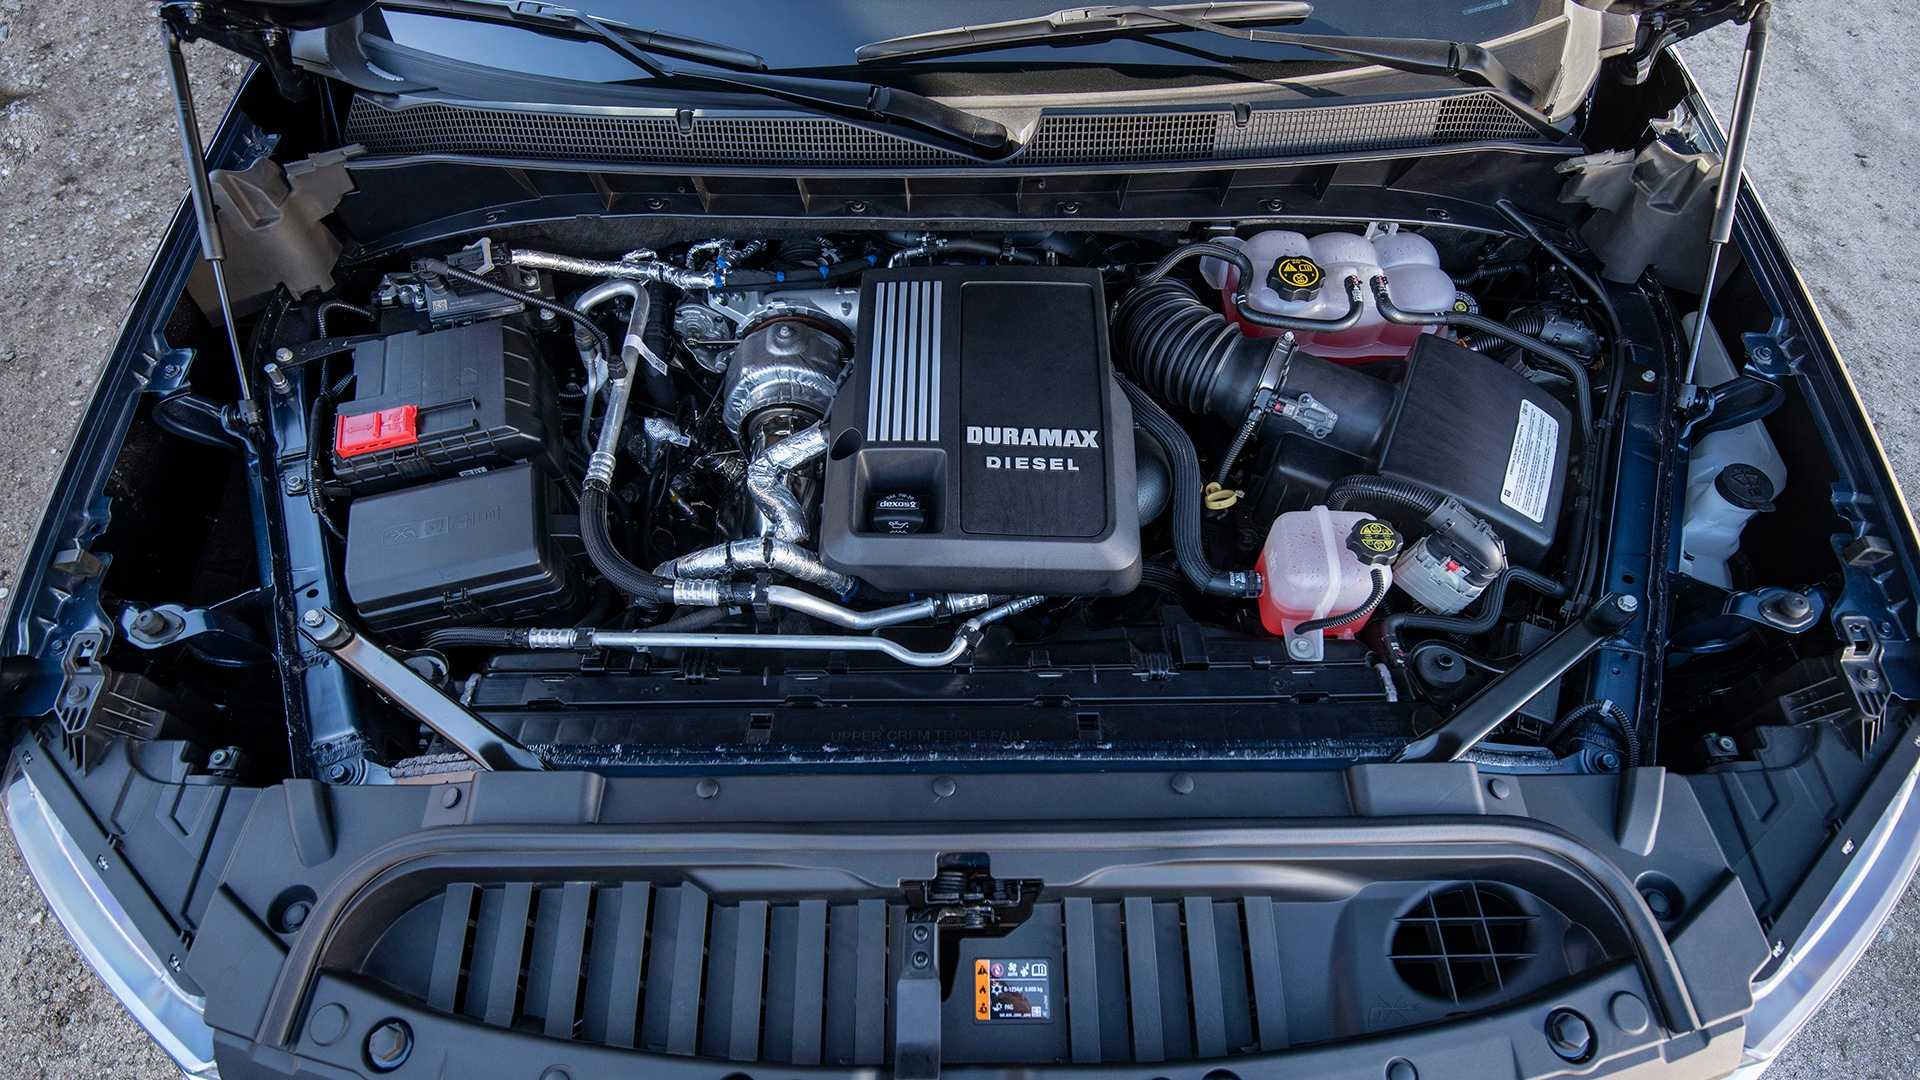 2020 Chevy Silverado 1500 Diesel Returns 33 Mpg Highway Report